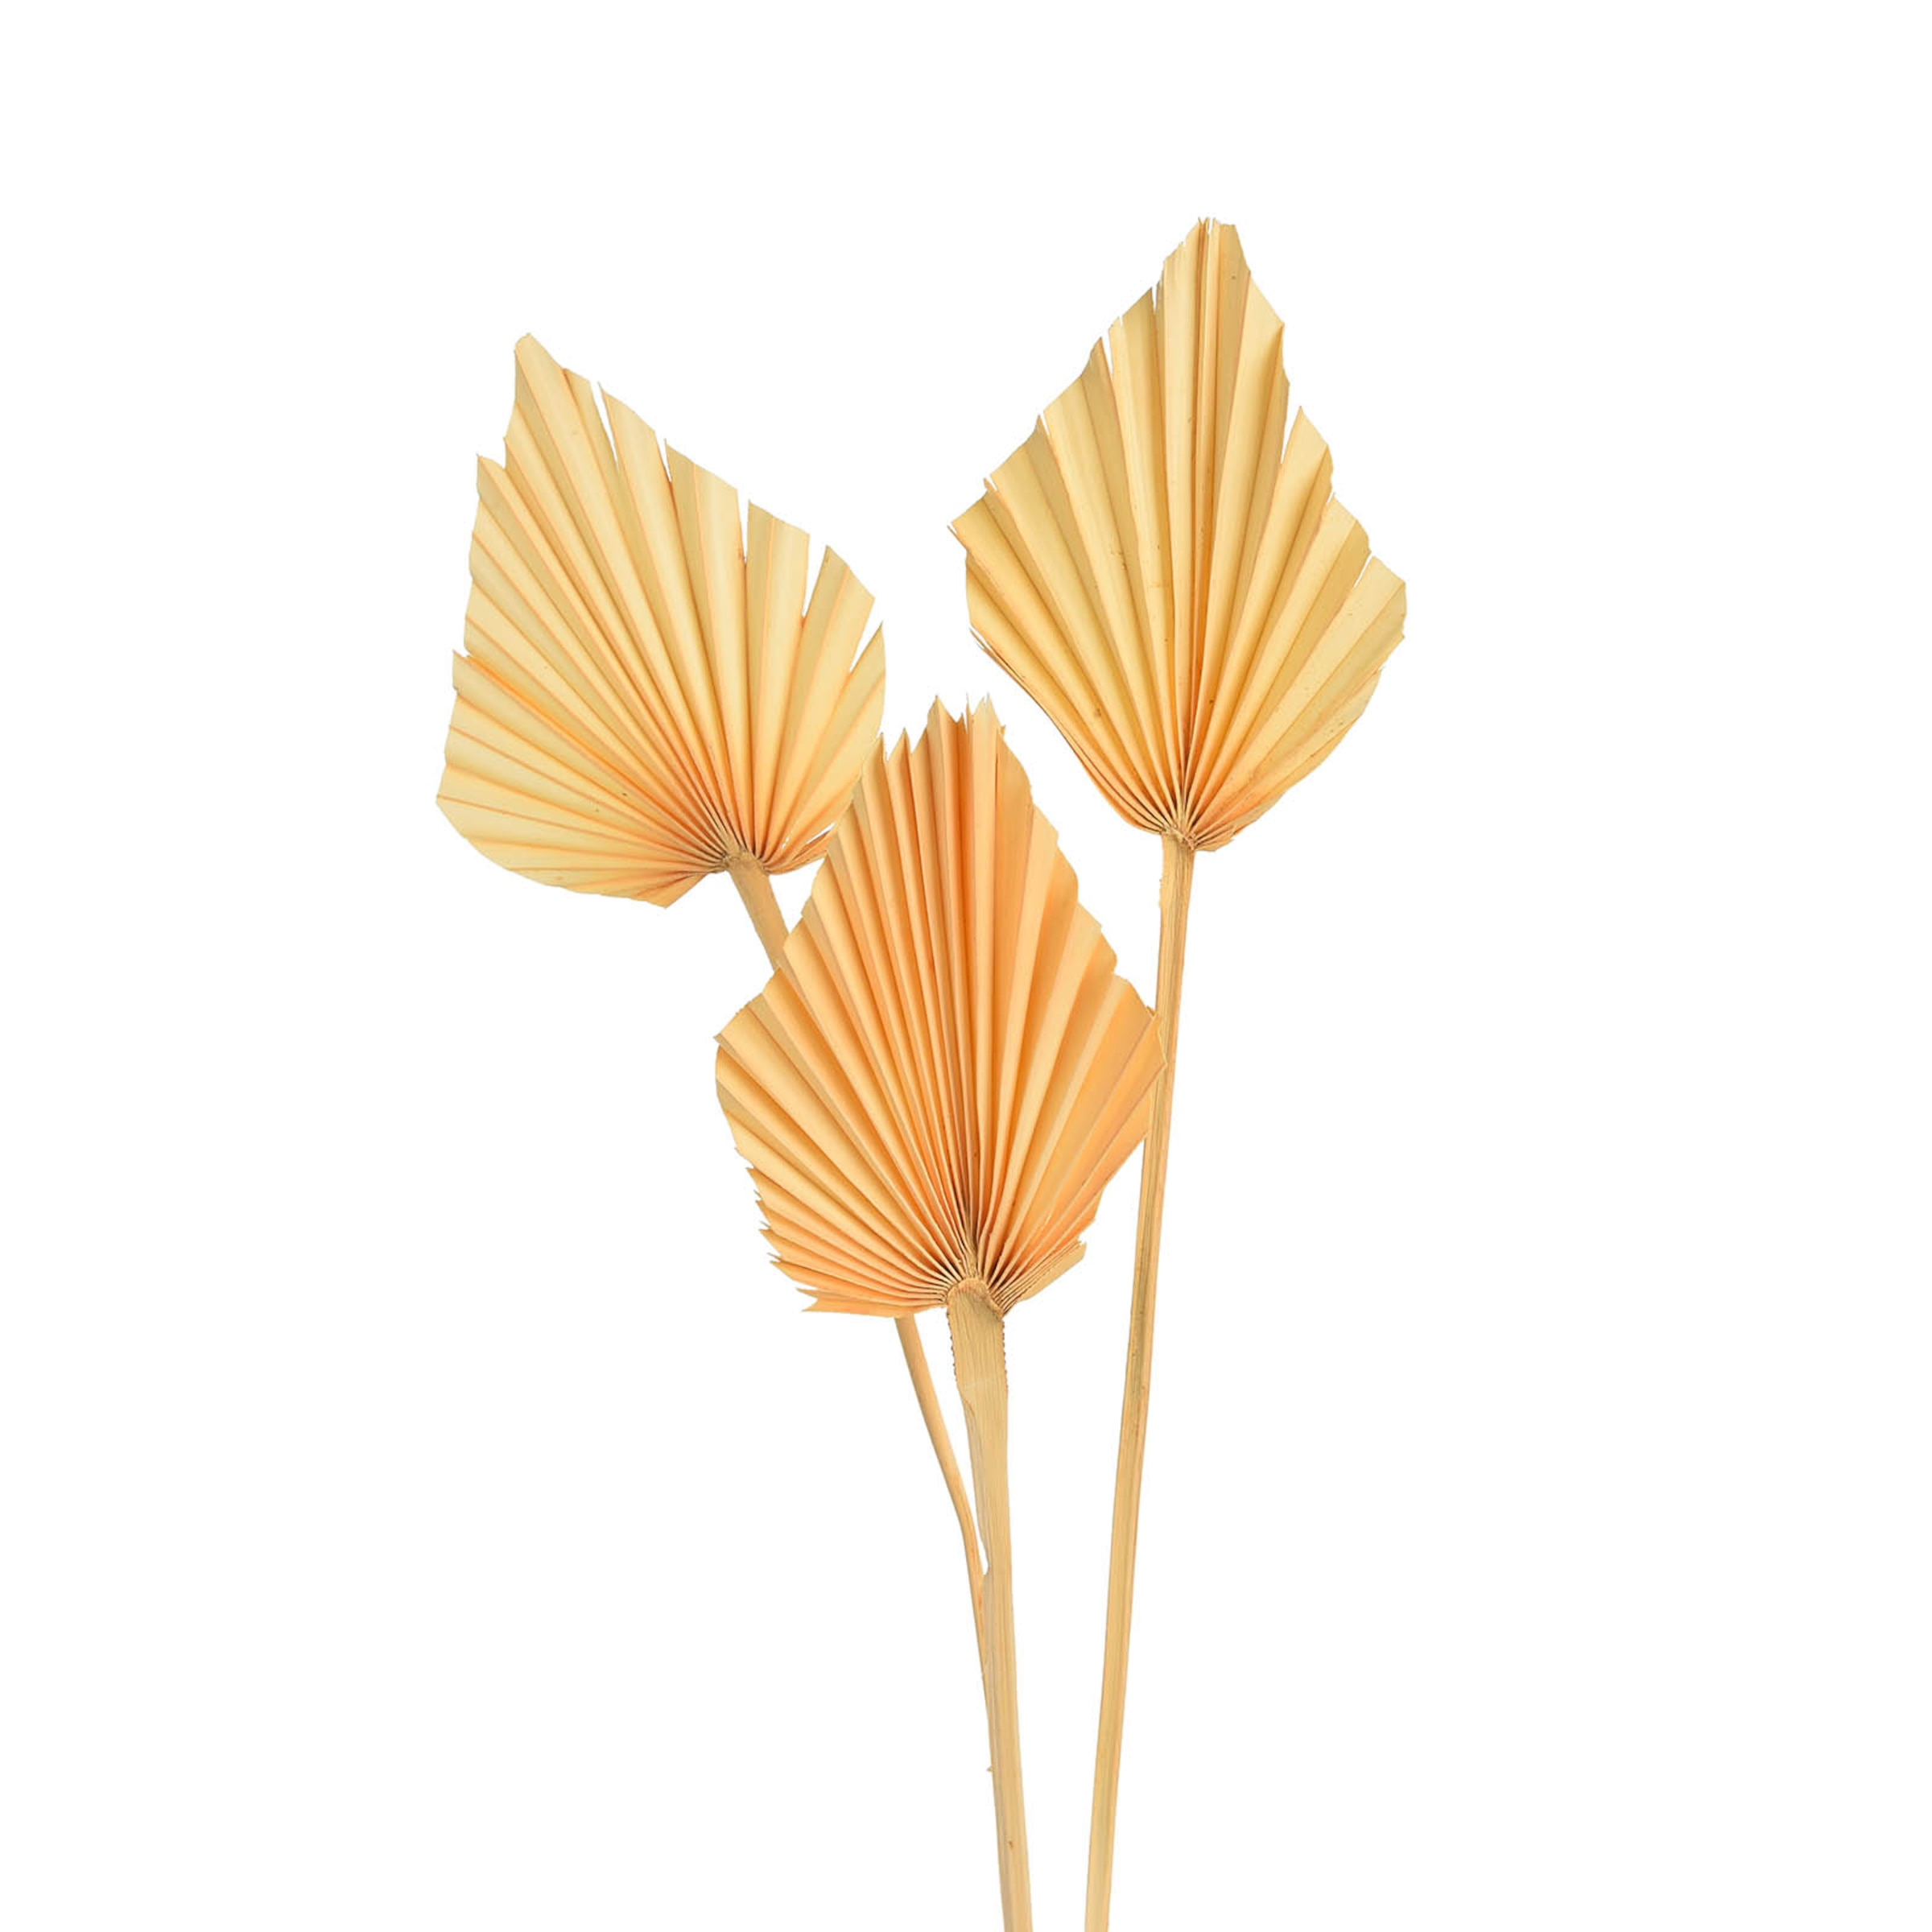 Trockenblume Palmleaf ca.40cm 3St, natur